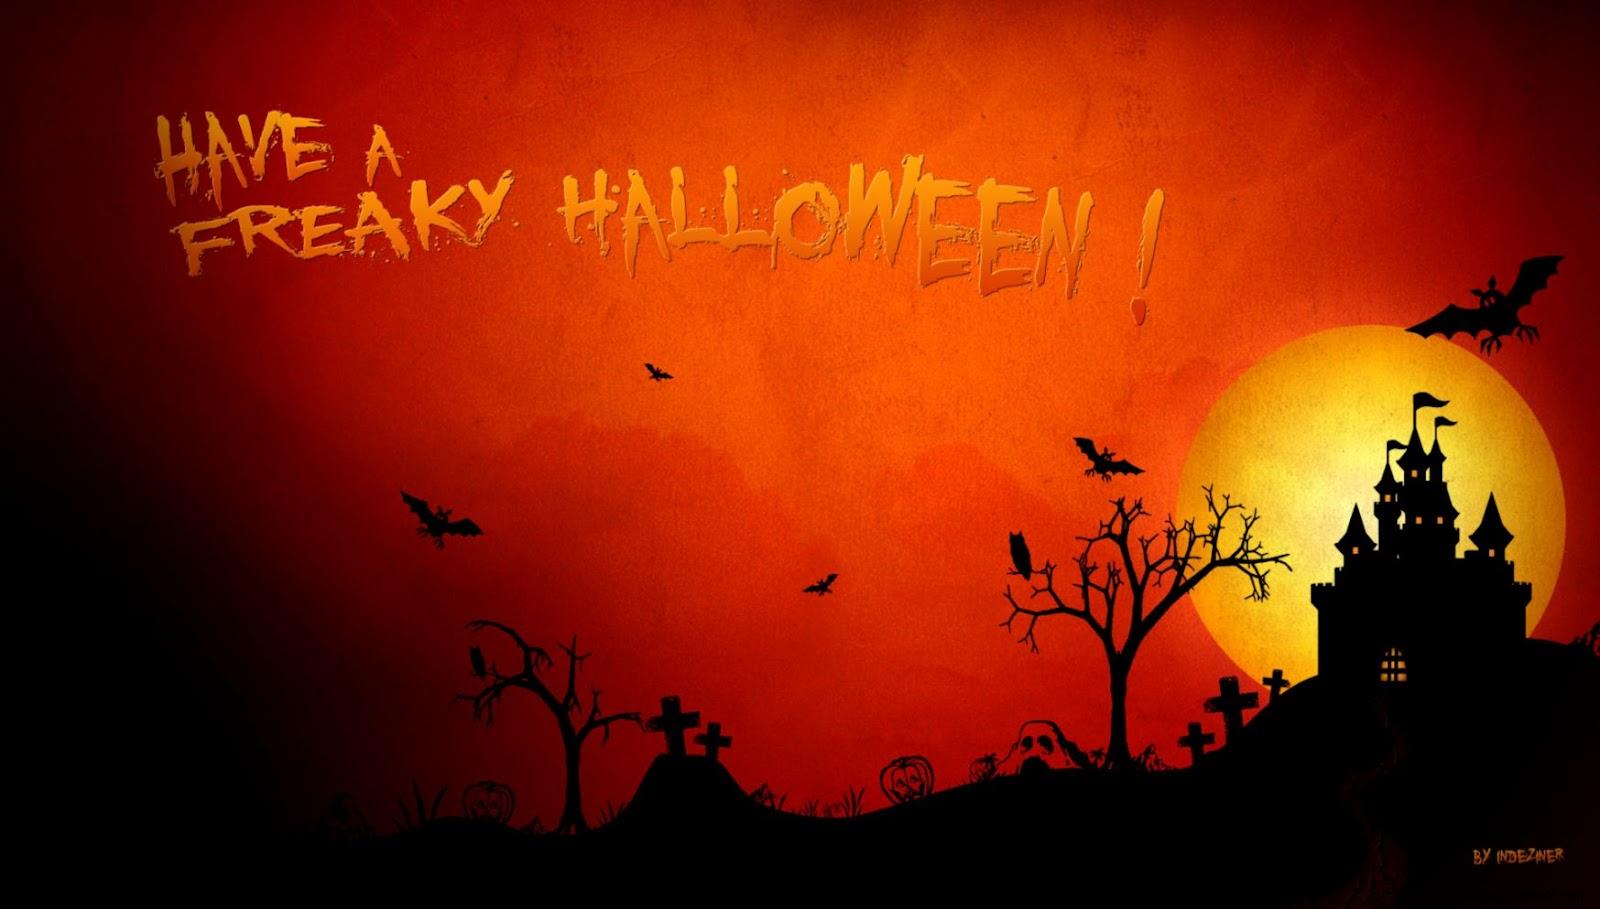 Freaky Halloween Desktop Pc And Mac Wallpaper | This Wallpapers